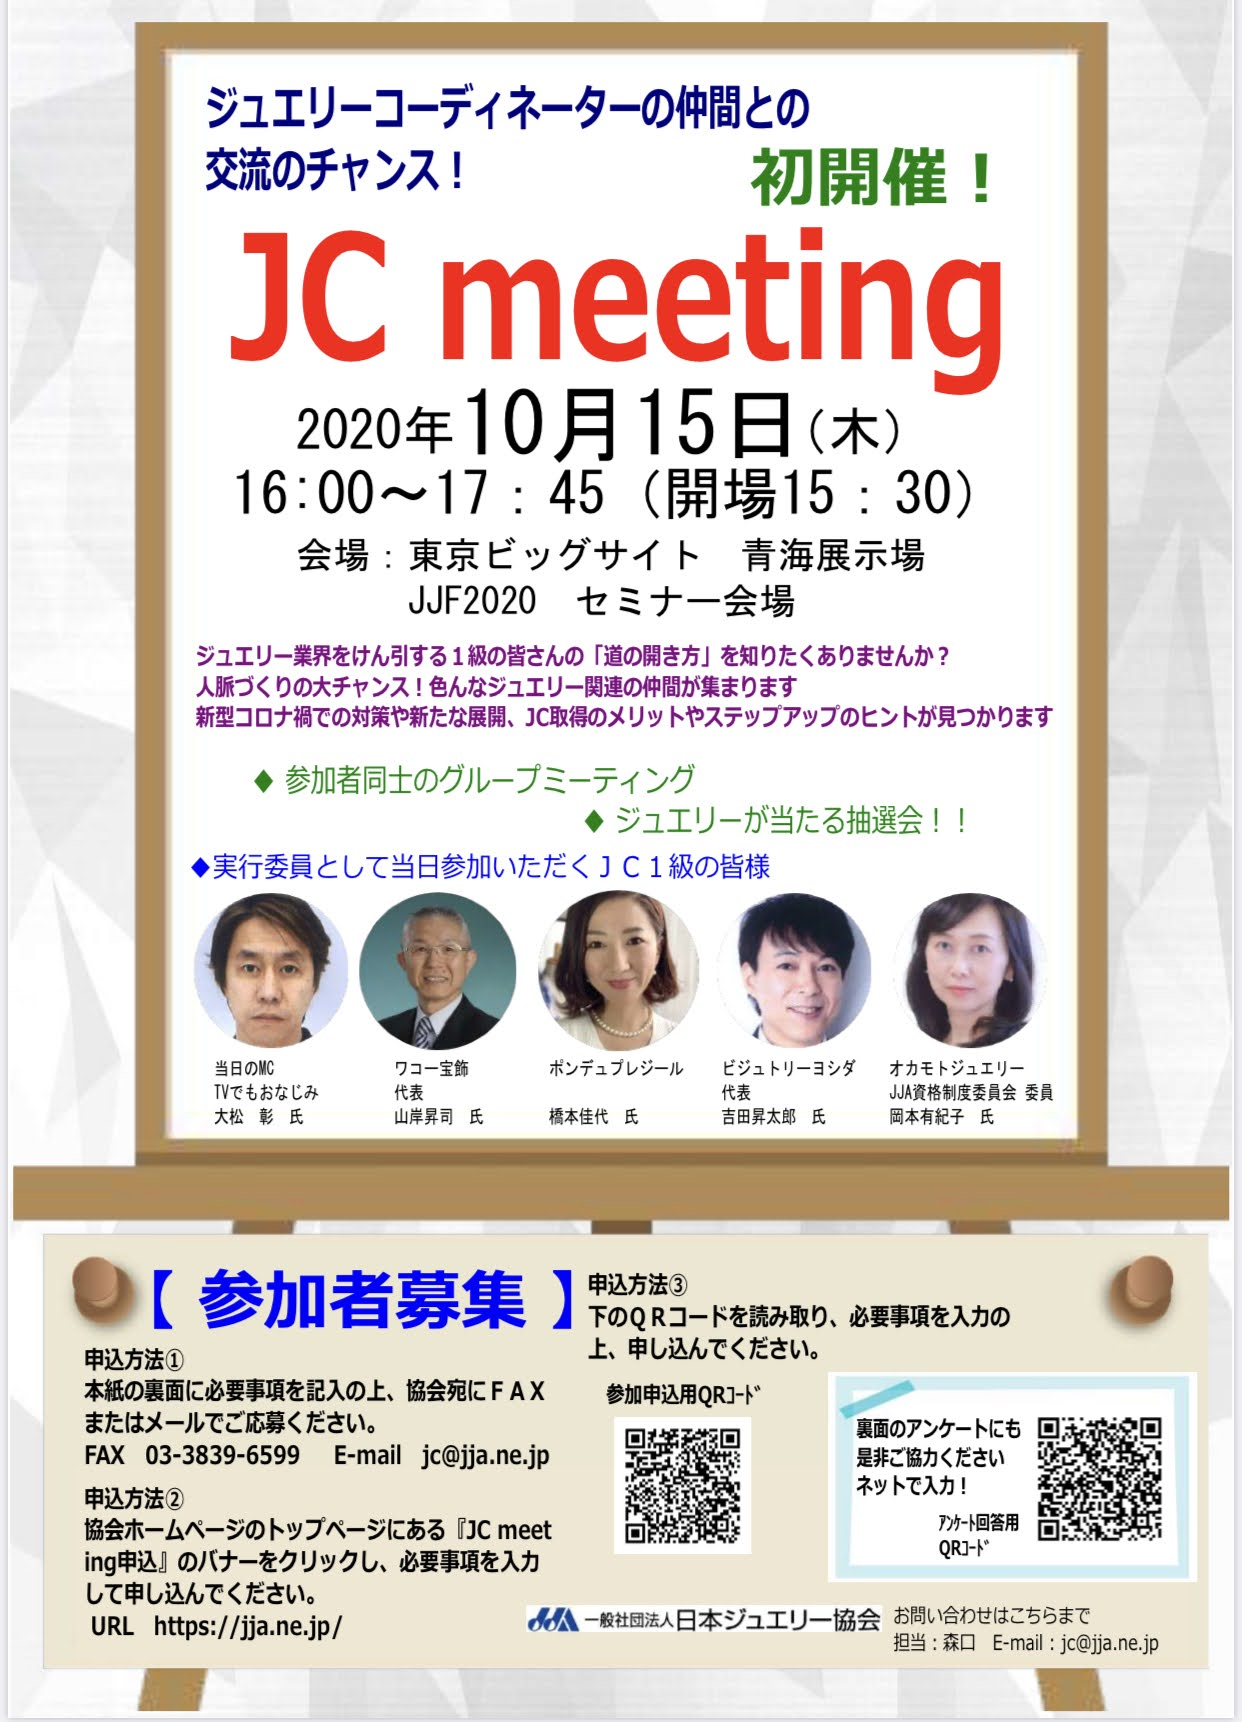 JC meeting